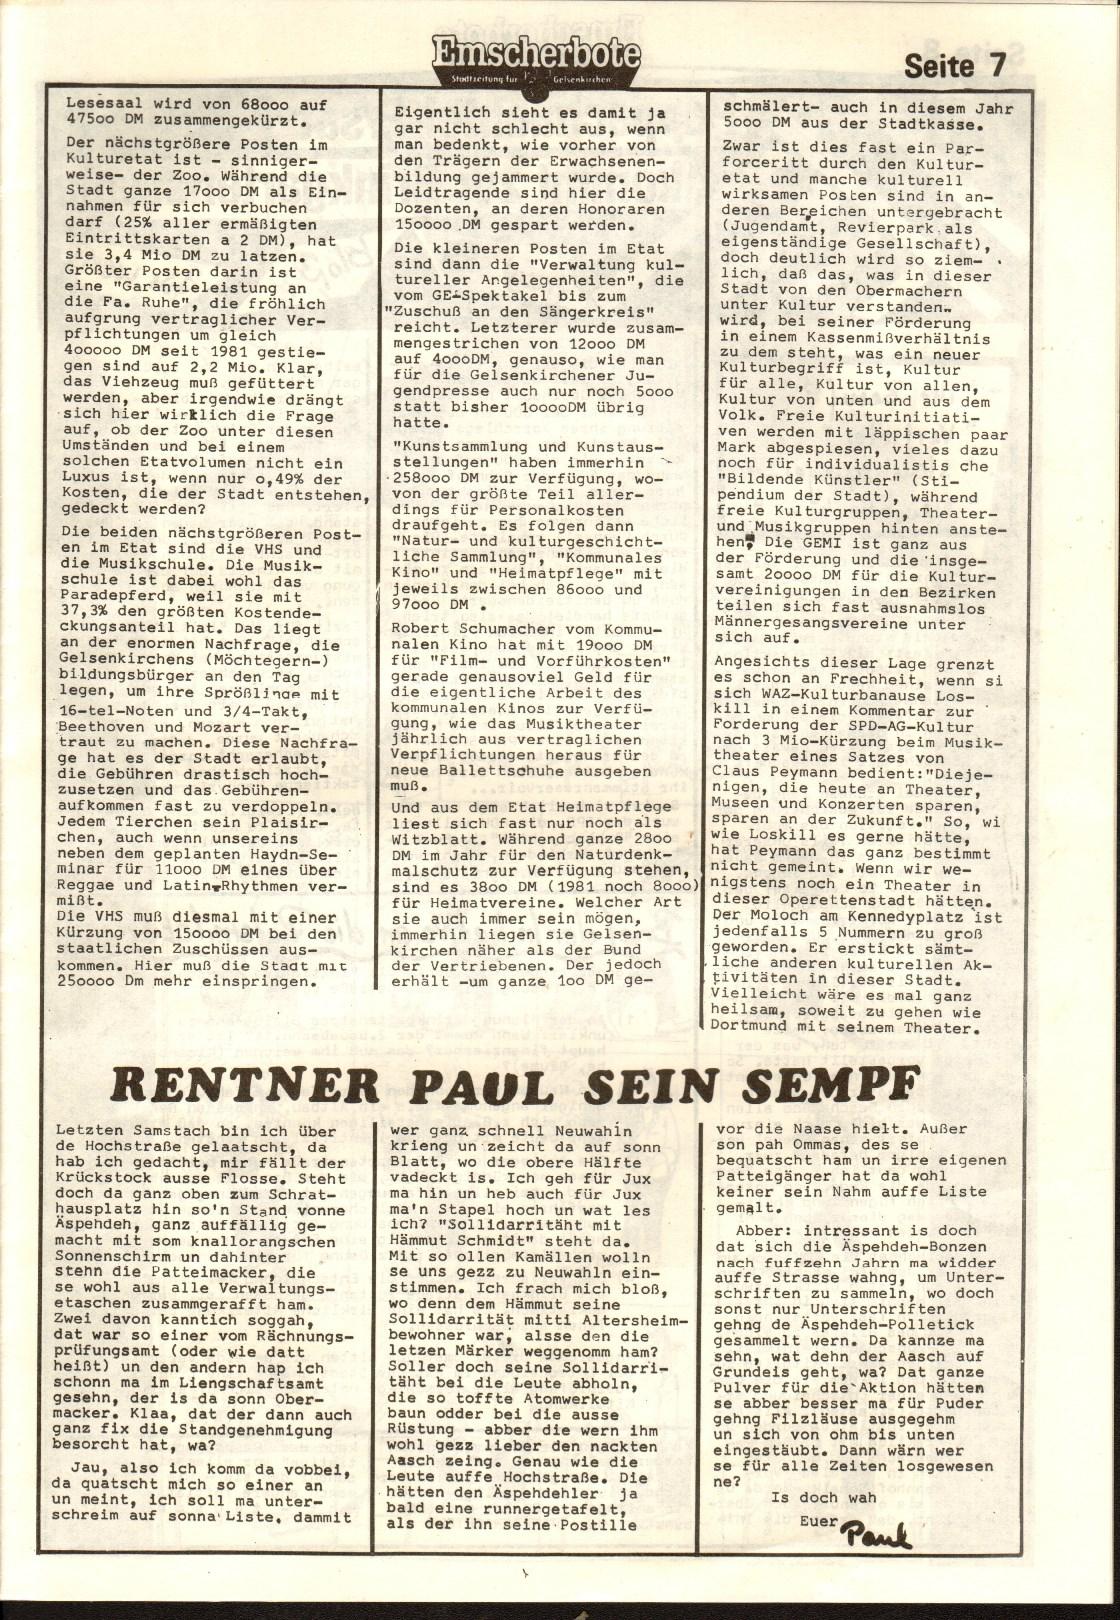 Gelsenkirchen_Emscherbote_1982_21_07